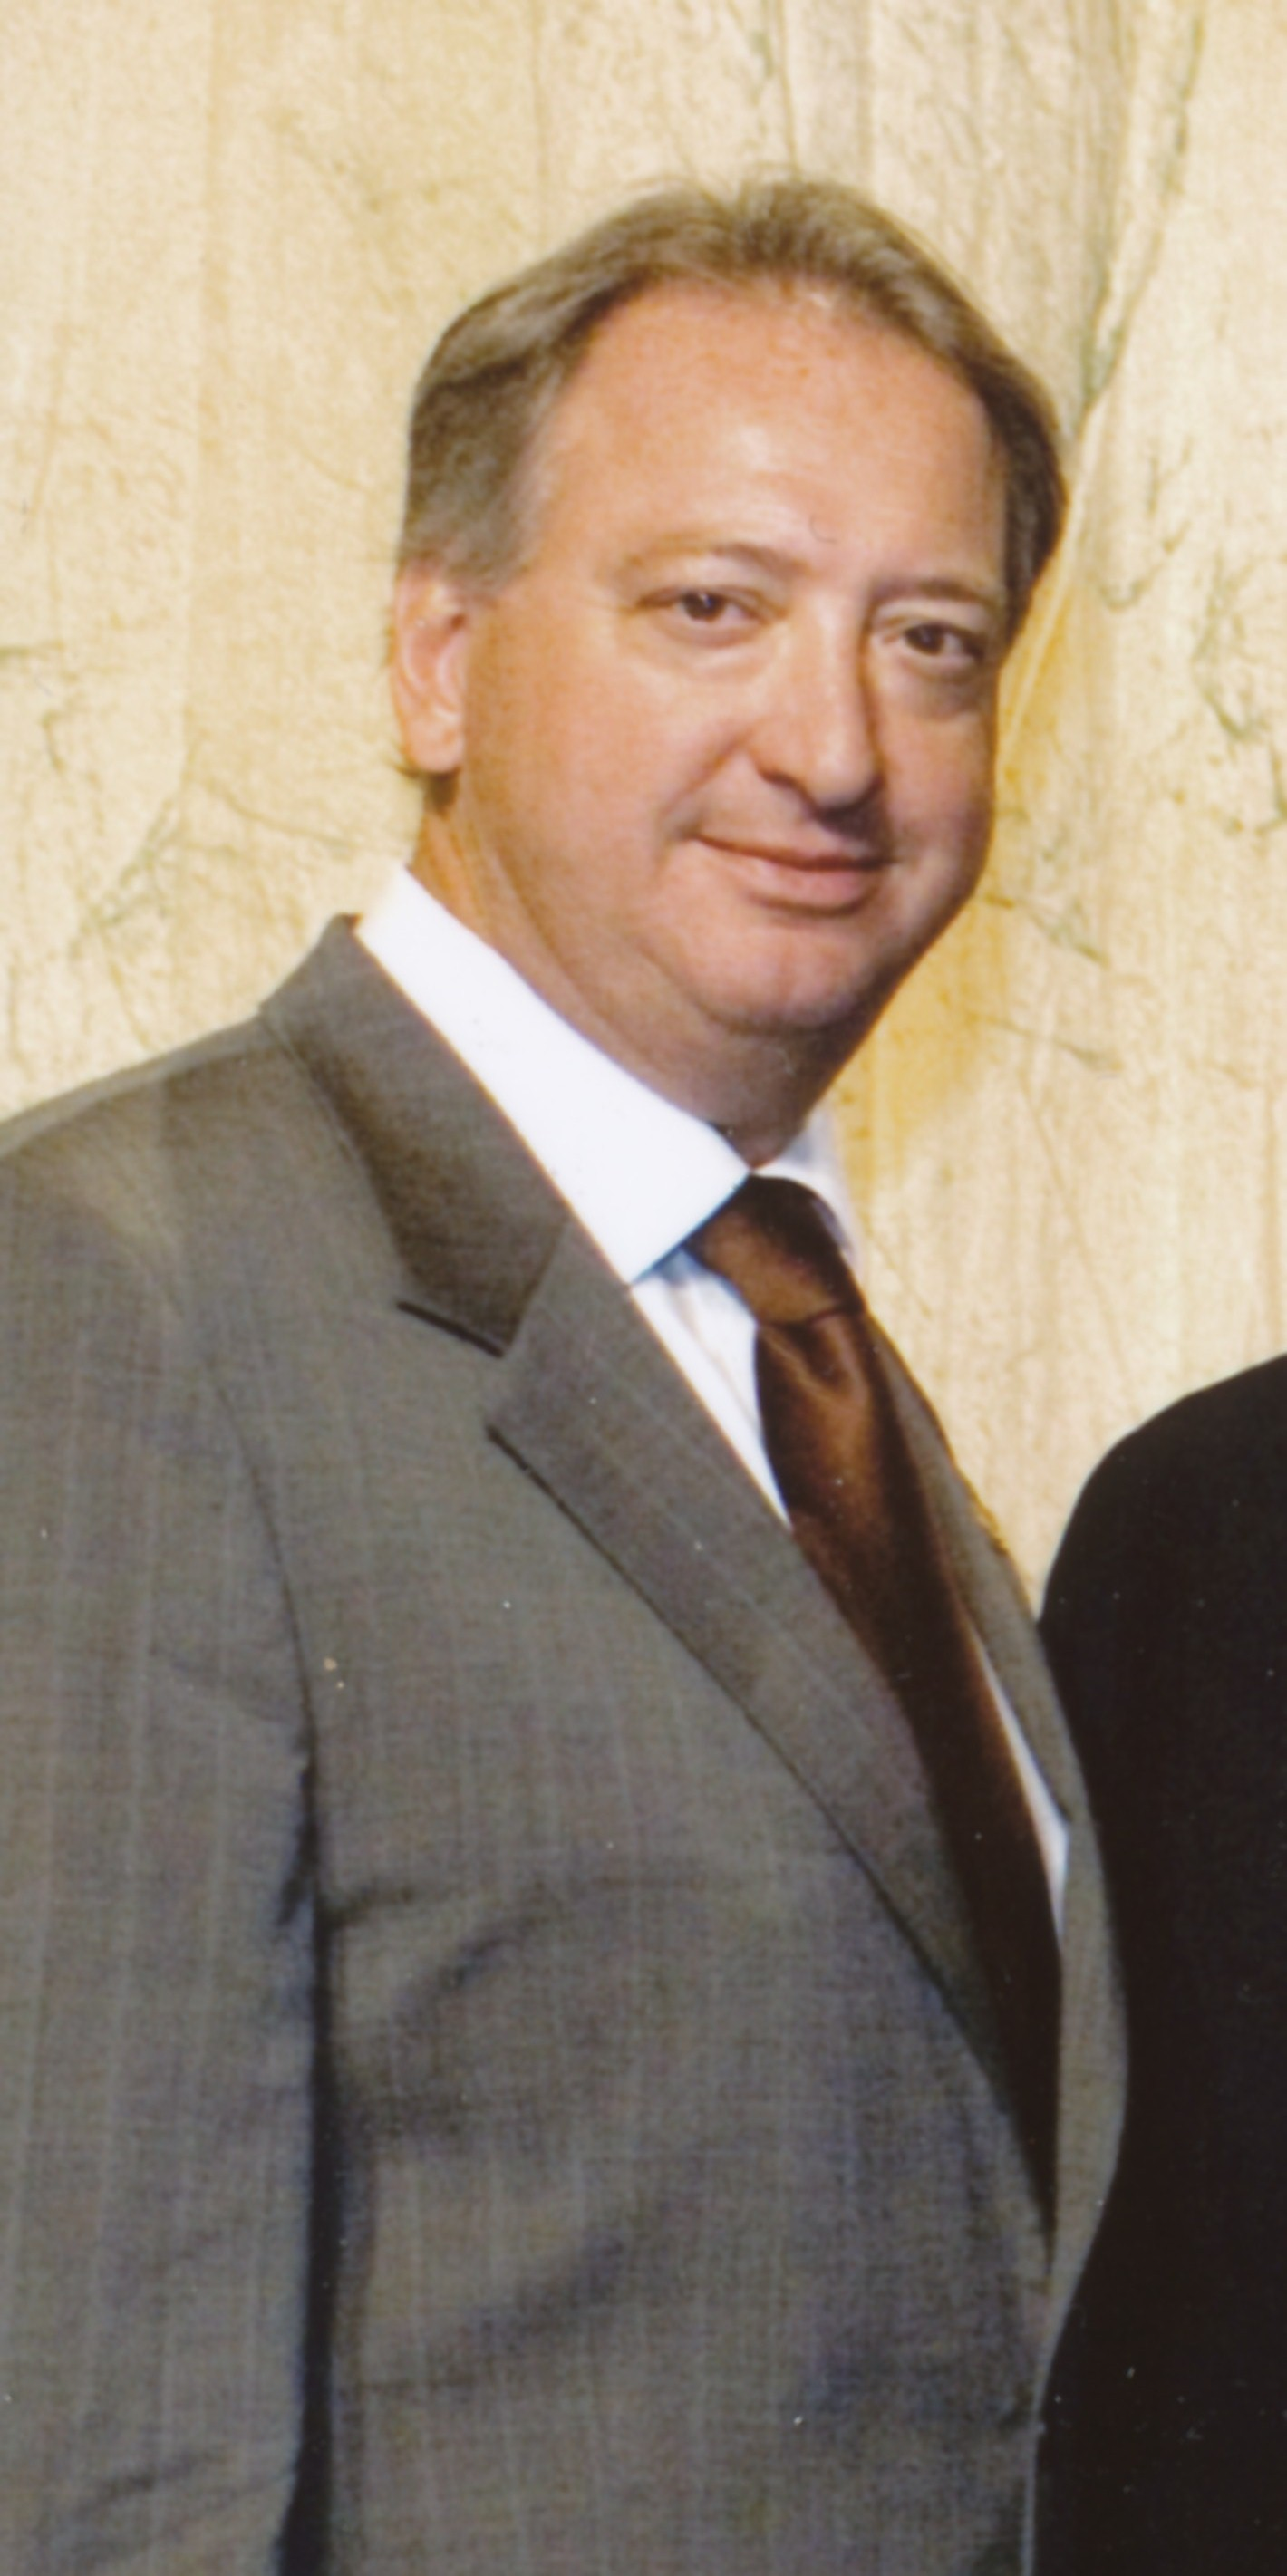 Claude Dauphin (politician) - Wikipedia